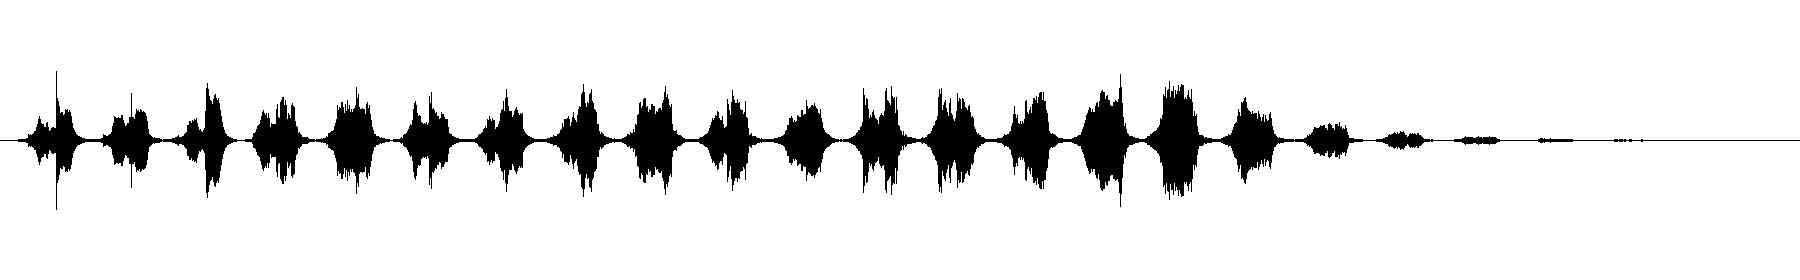 23 synth loop b